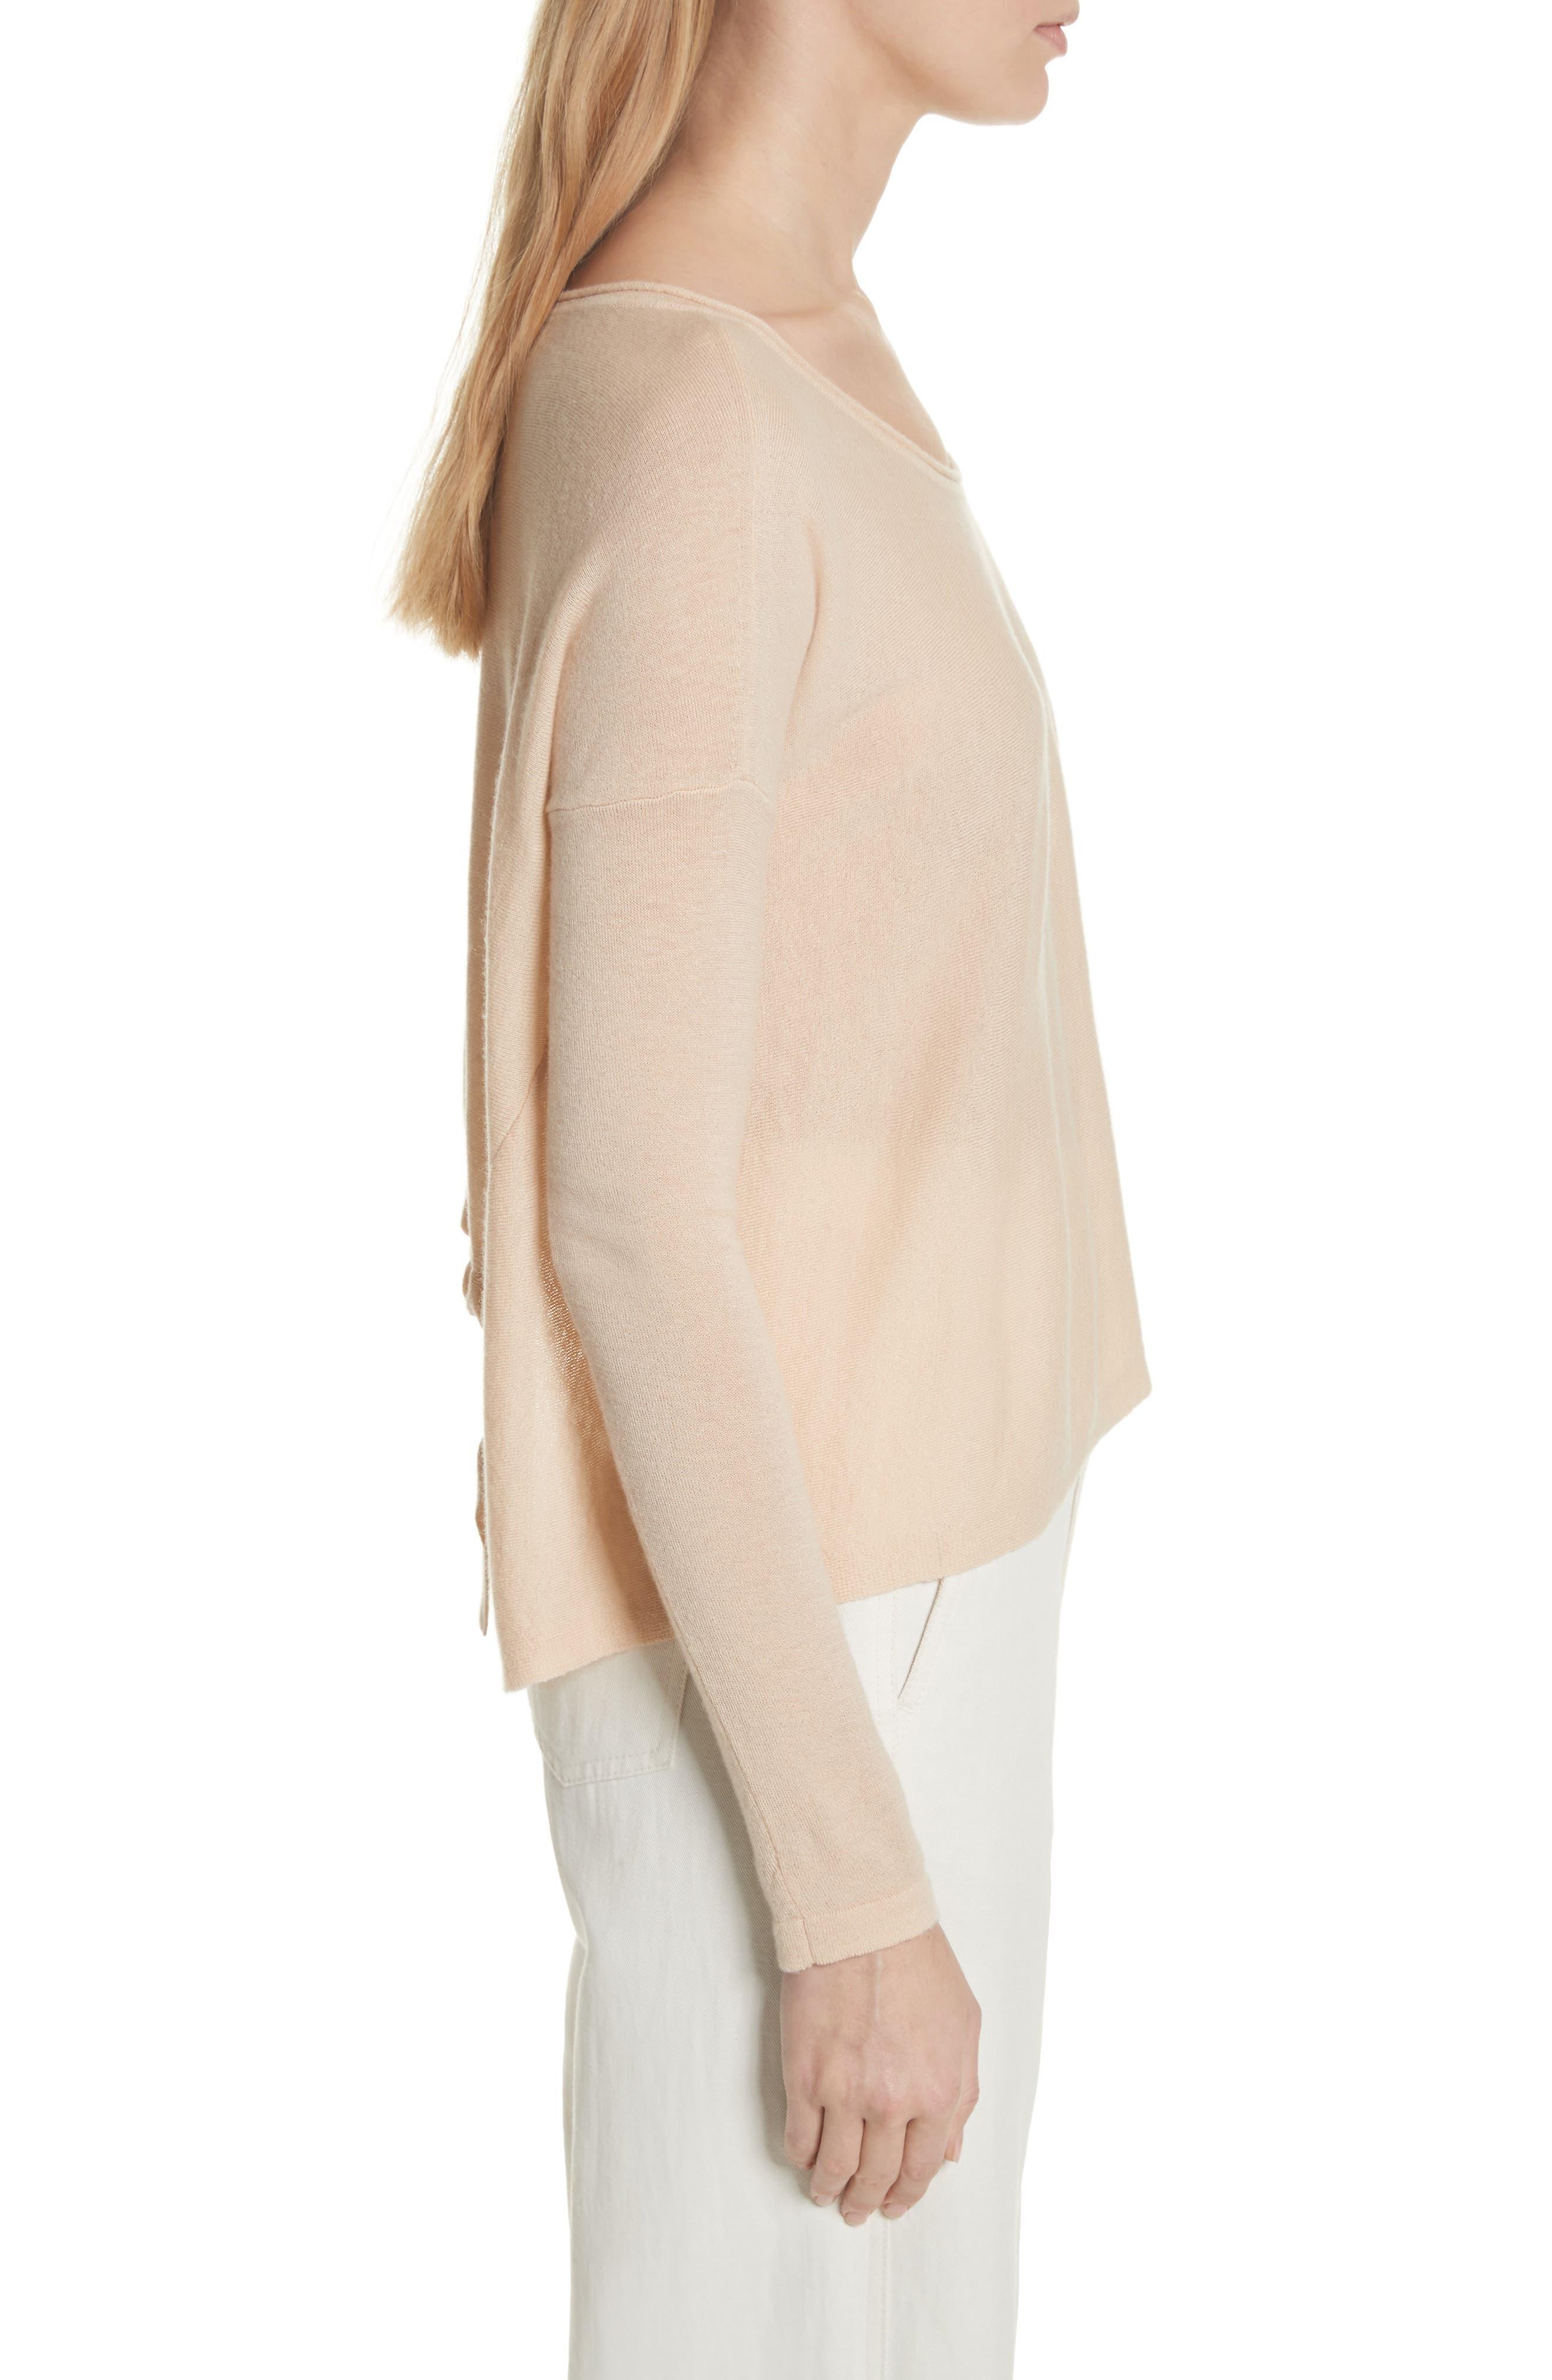 VINCE,                             Cinched Back Cashmere Sweater,                             Alternate thumbnail 3, color,                             298